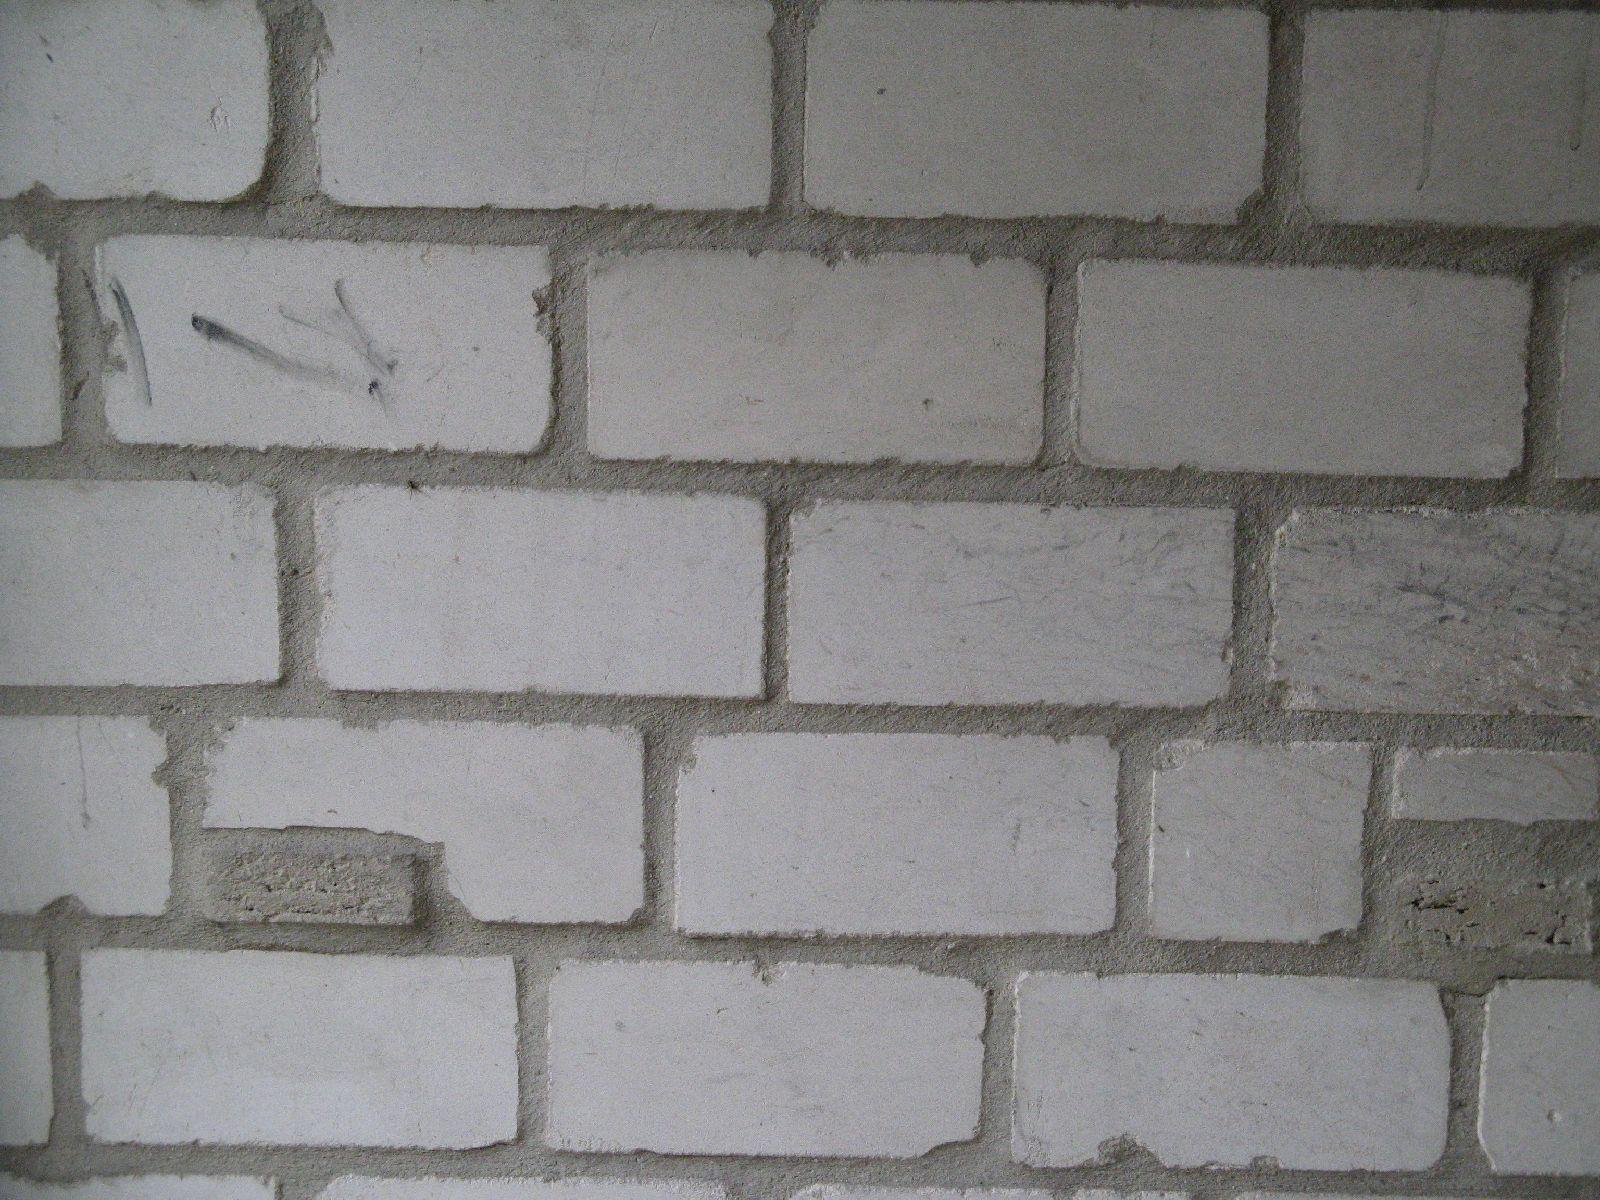 Brick_Texture_B_1129